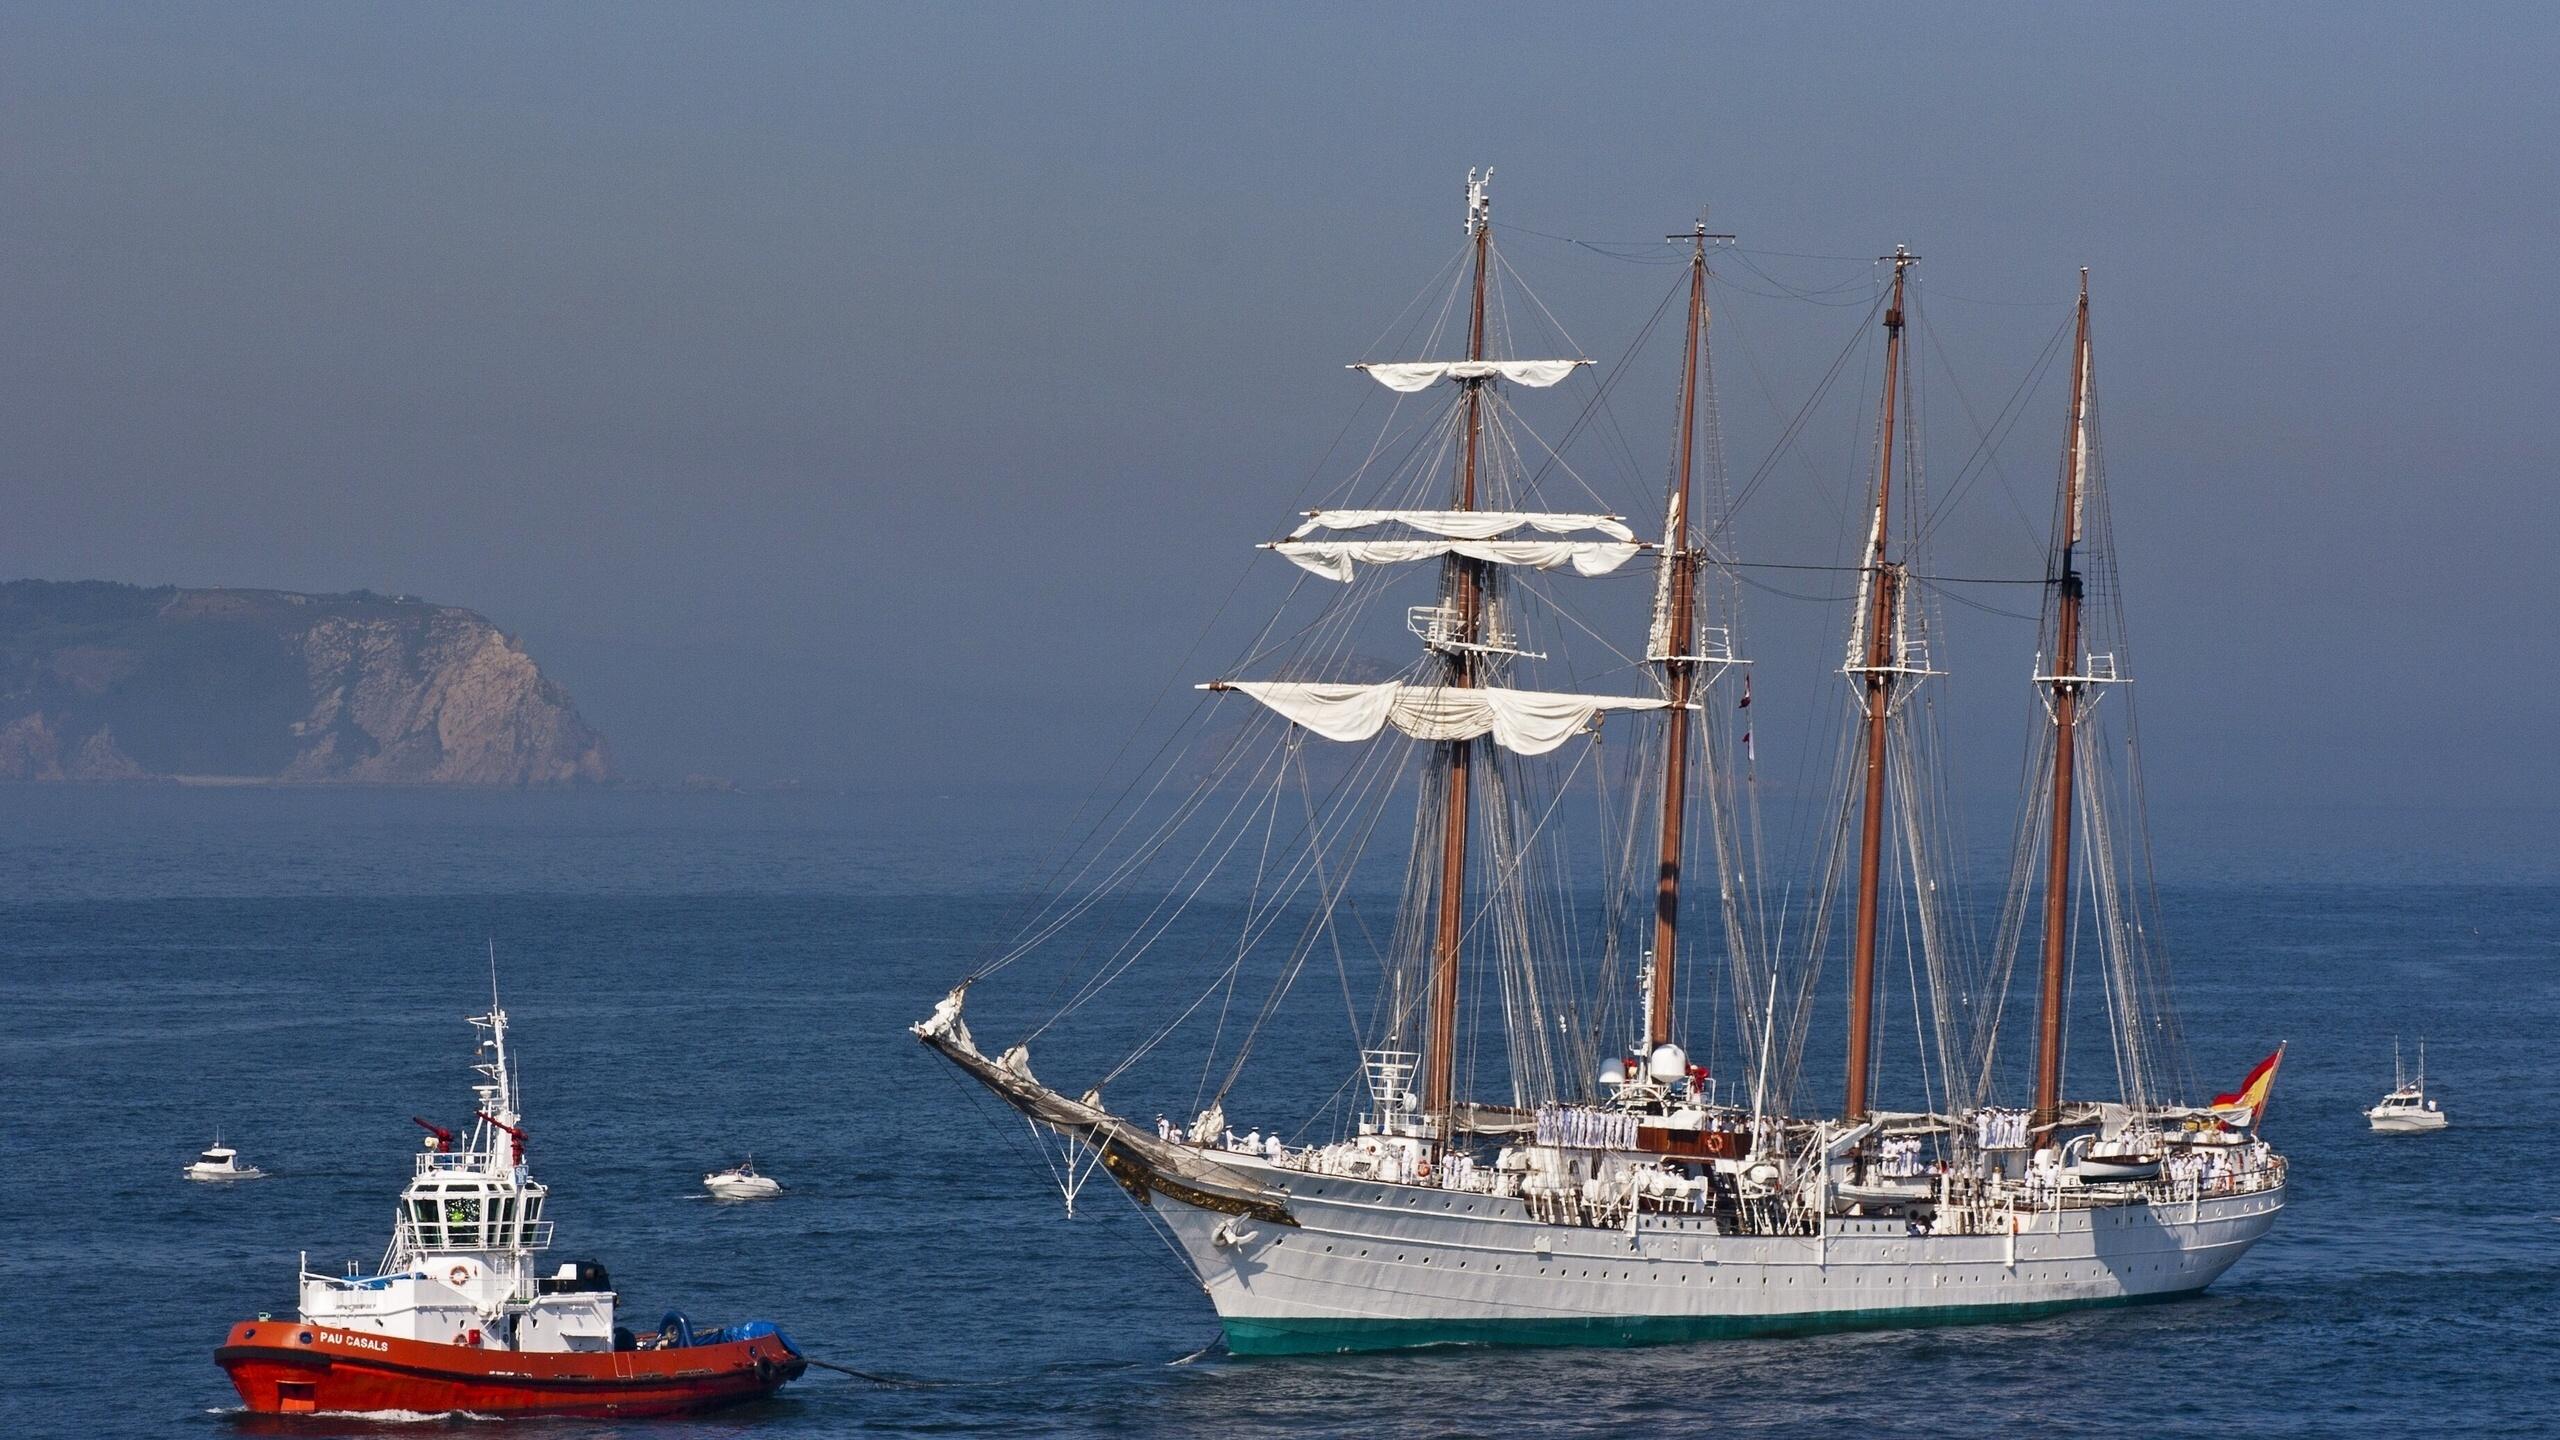 океан, корабль, буксир